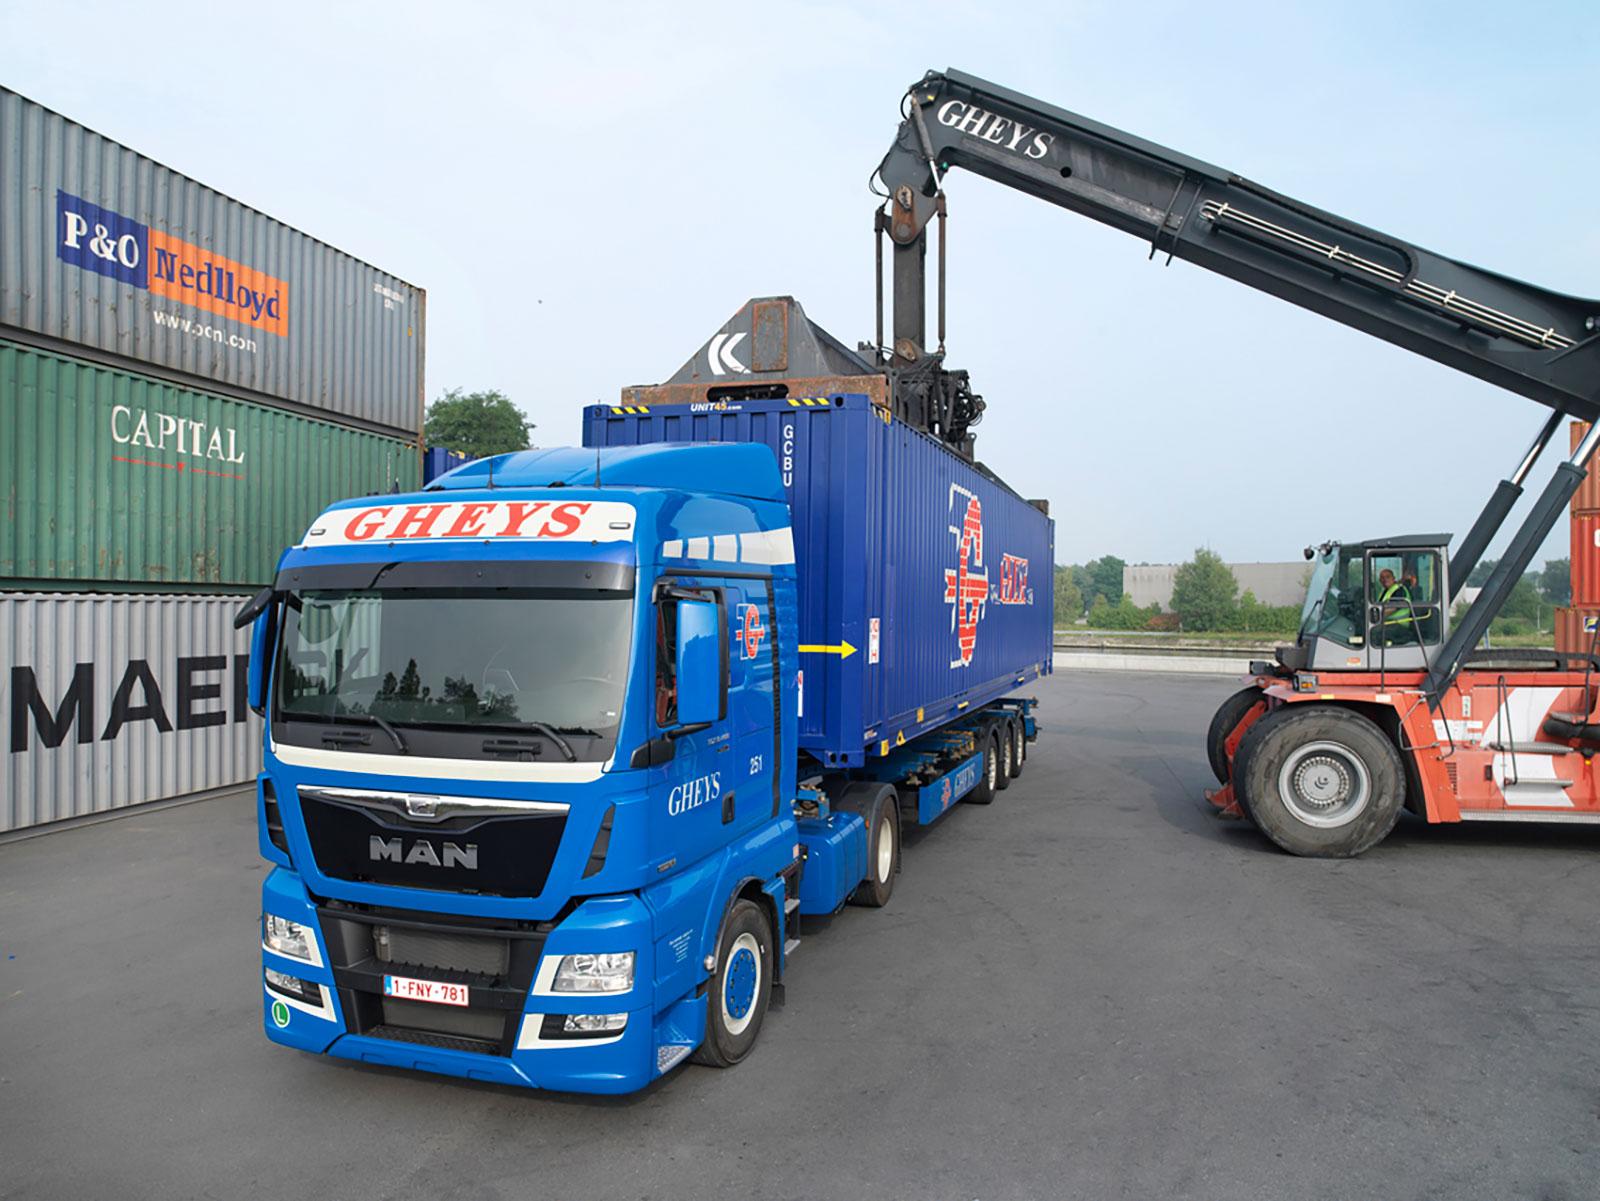 Container transport - TRANSPORT COMPANY GHEYS (BELGIUM)